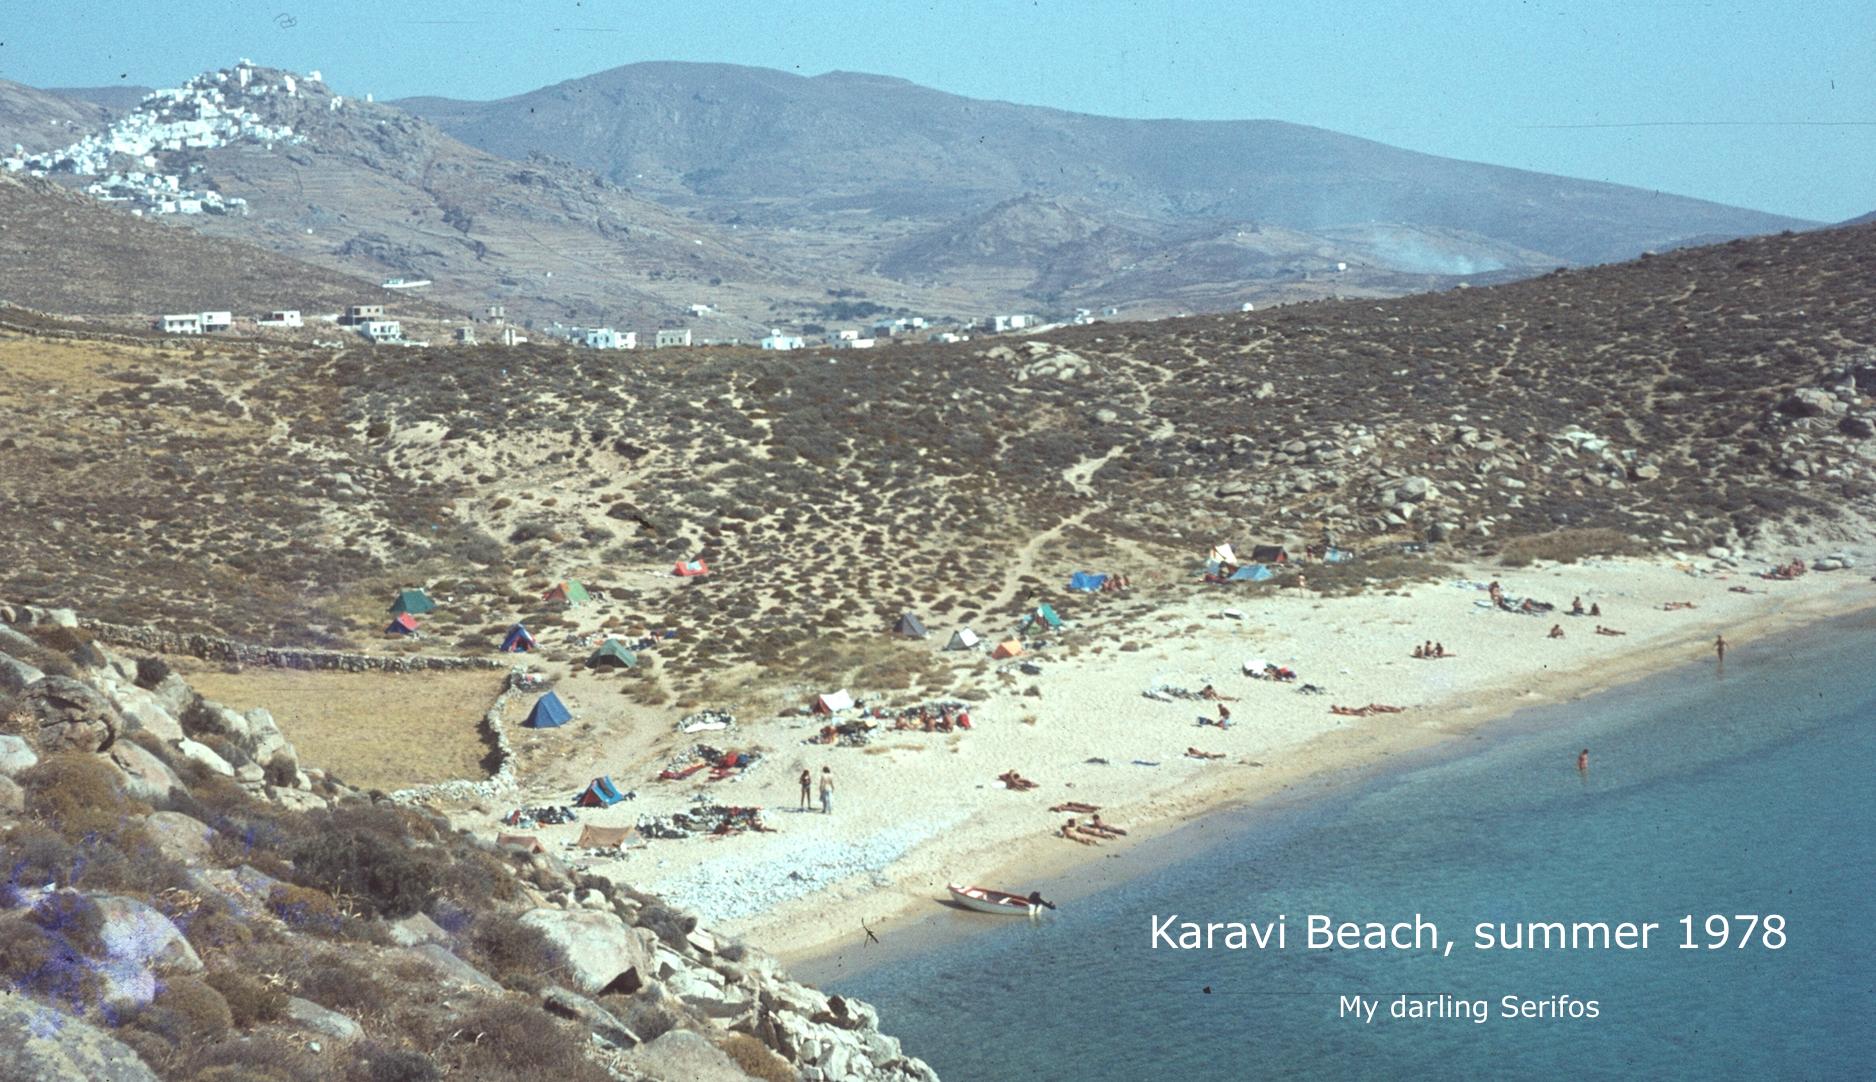 Serifos_island_old_photo_1978_karavi_my_darling_serifos